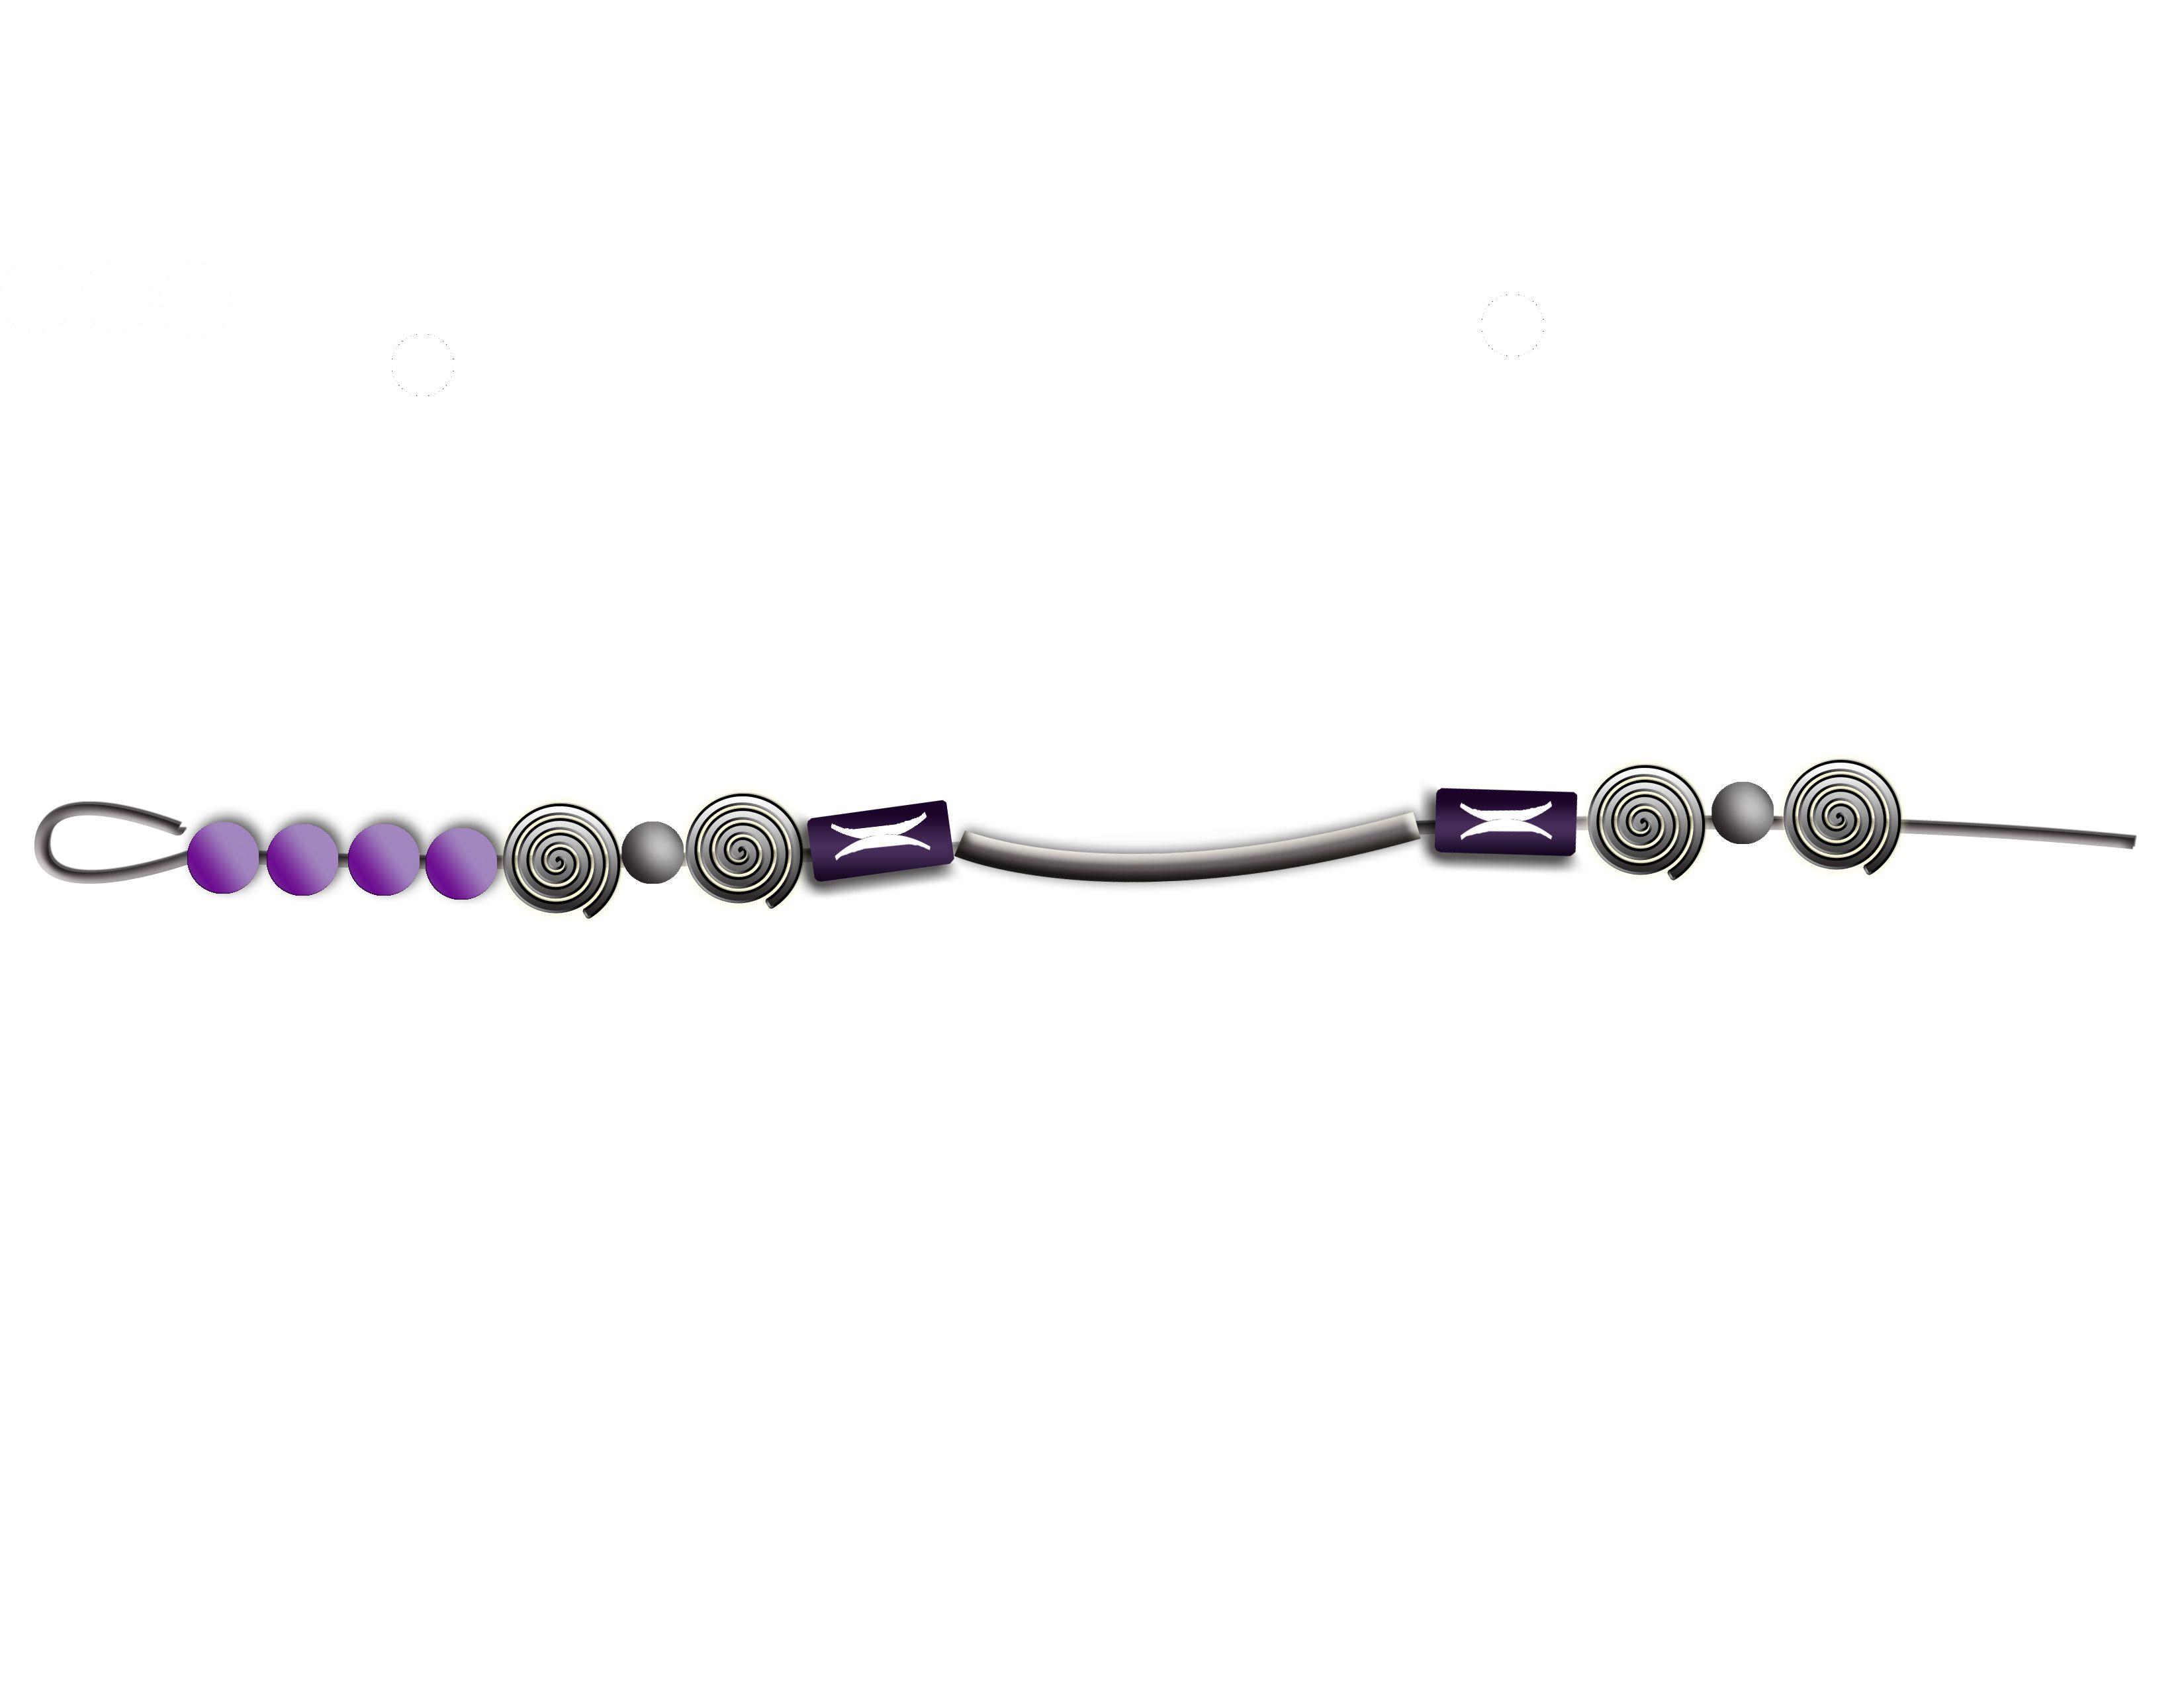 Boho Memory Wire Wrap Bracelet with a Paper Bead Twist